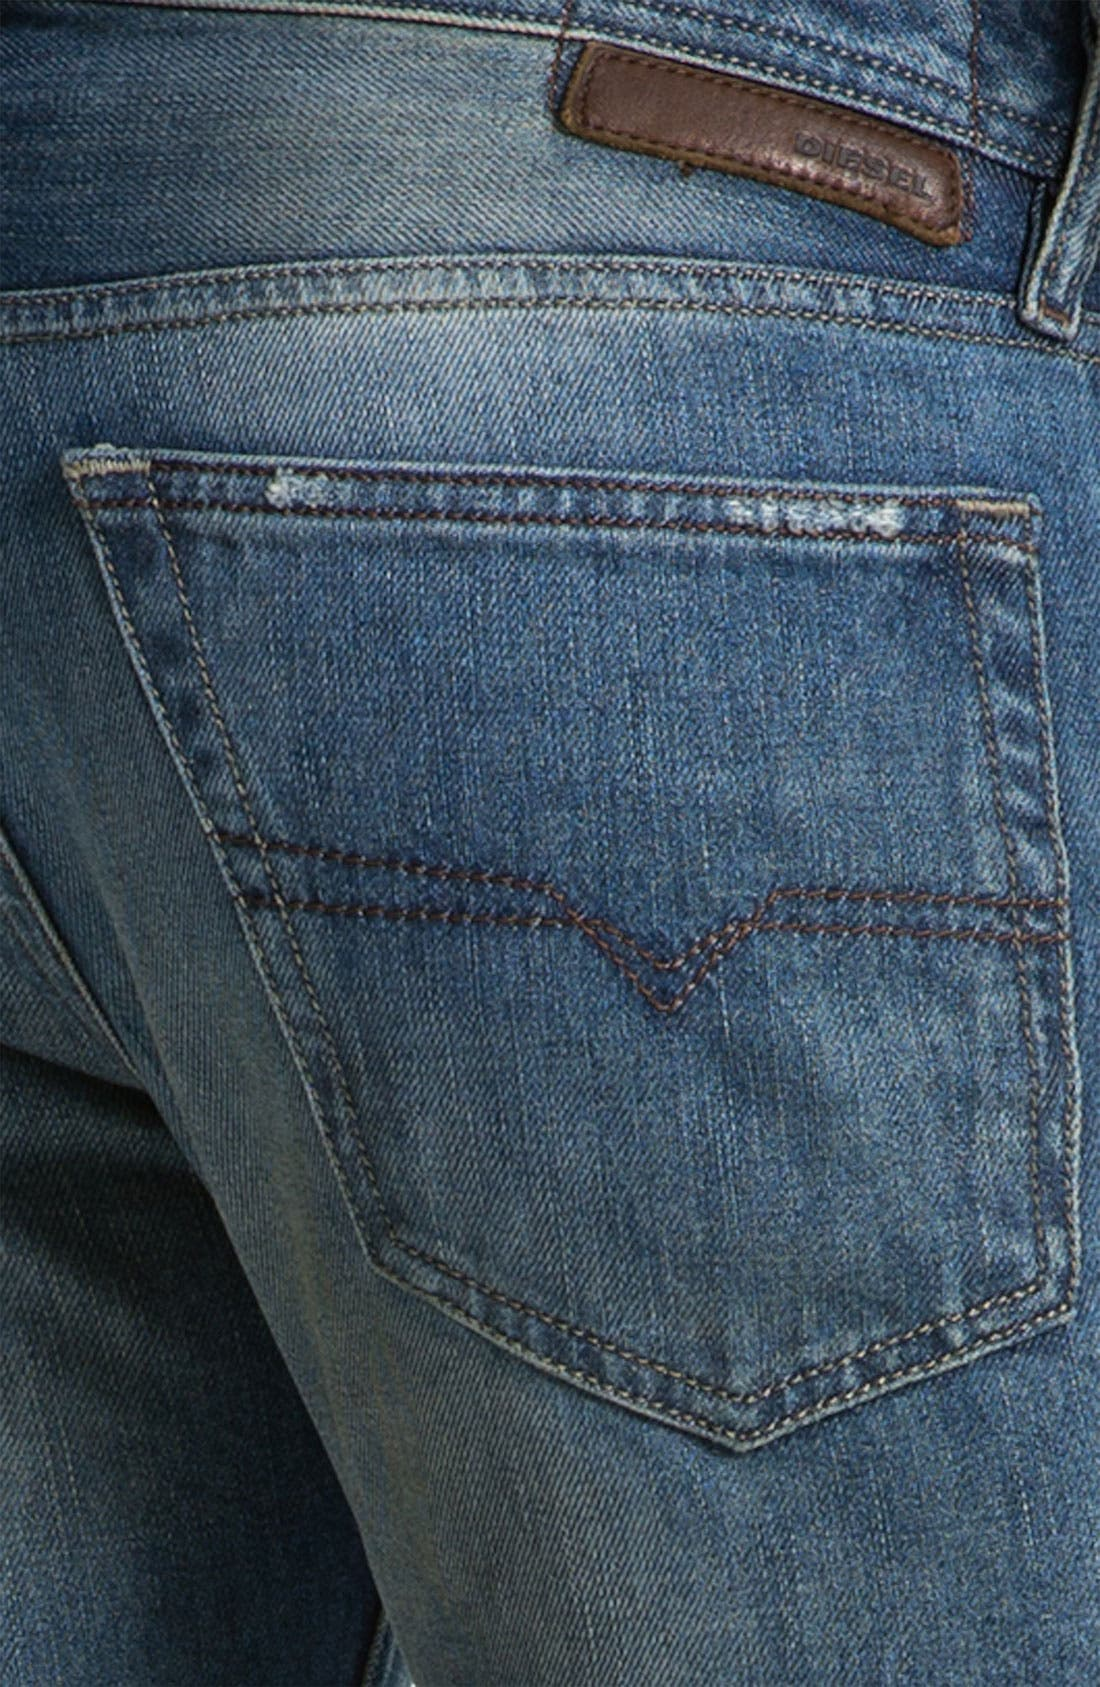 'New Fanker' Slim Bootcut Jeans,                             Alternate thumbnail 6, color,                             400